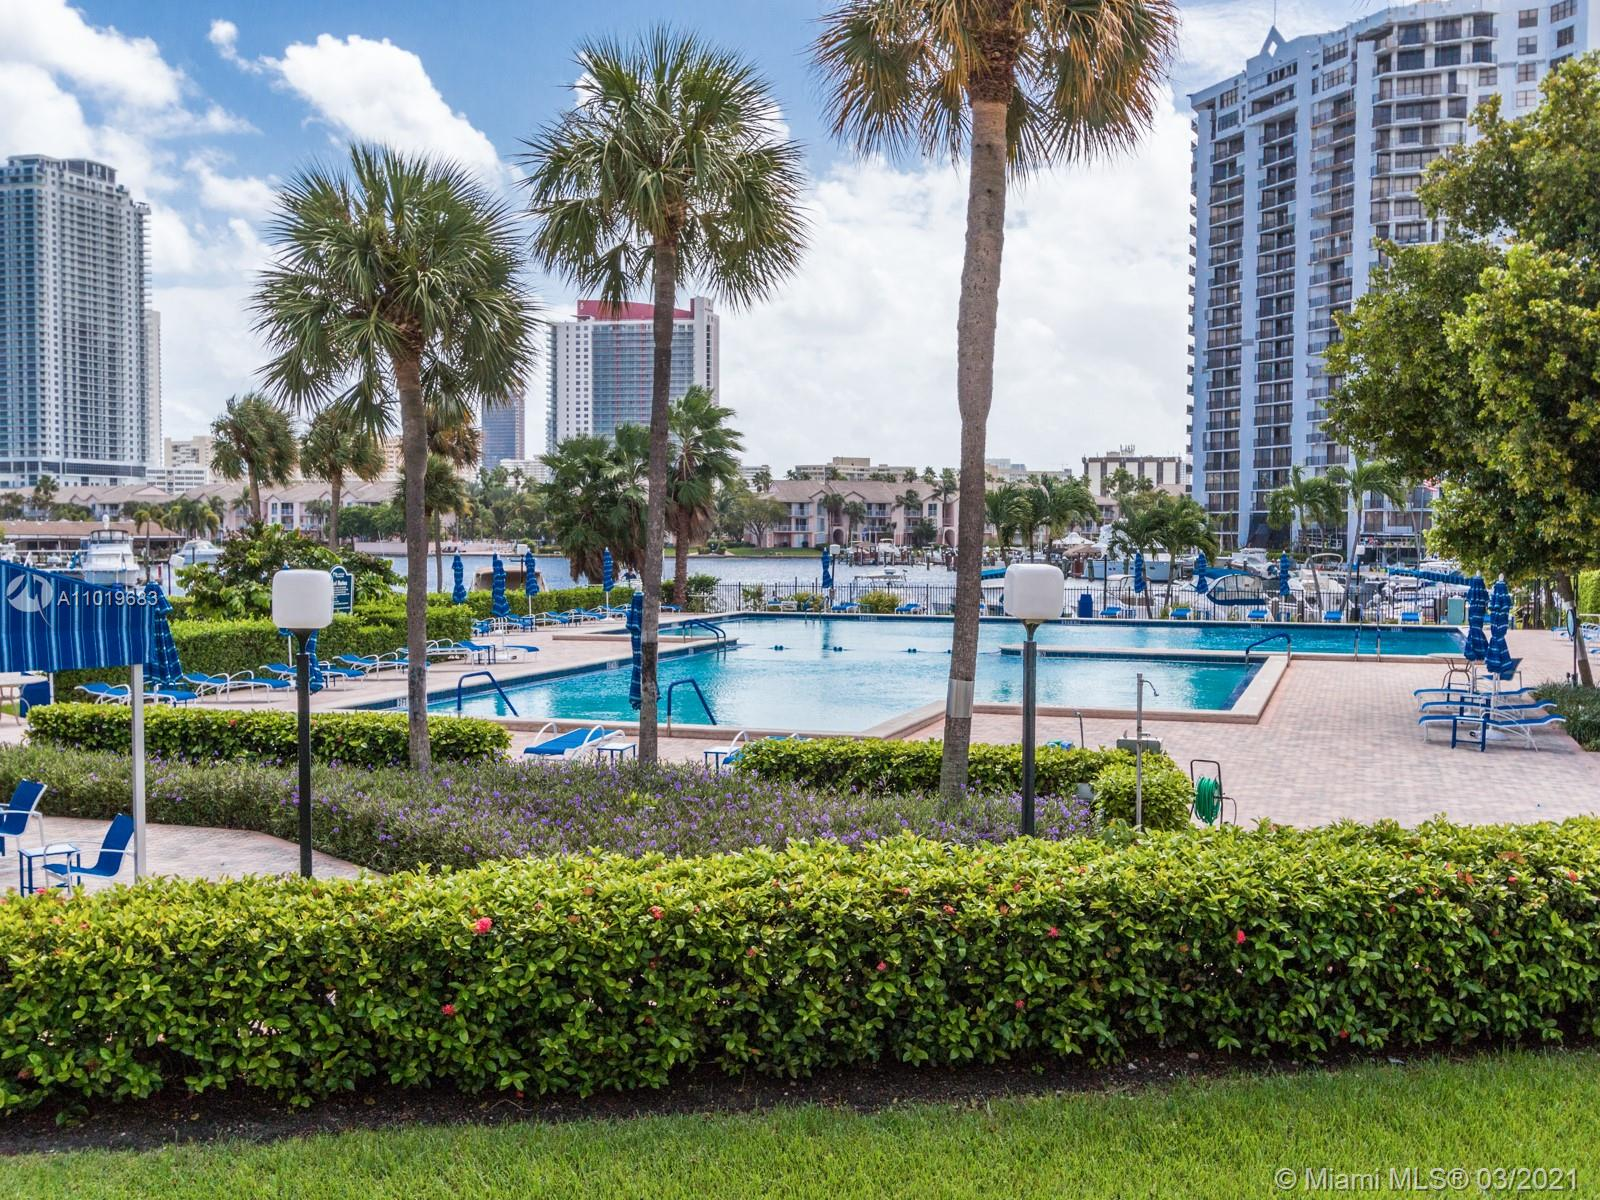 Photo of 2500 PARKVIEW DR. #1406, Hallandale Beach, Florida, 33009 - GYM